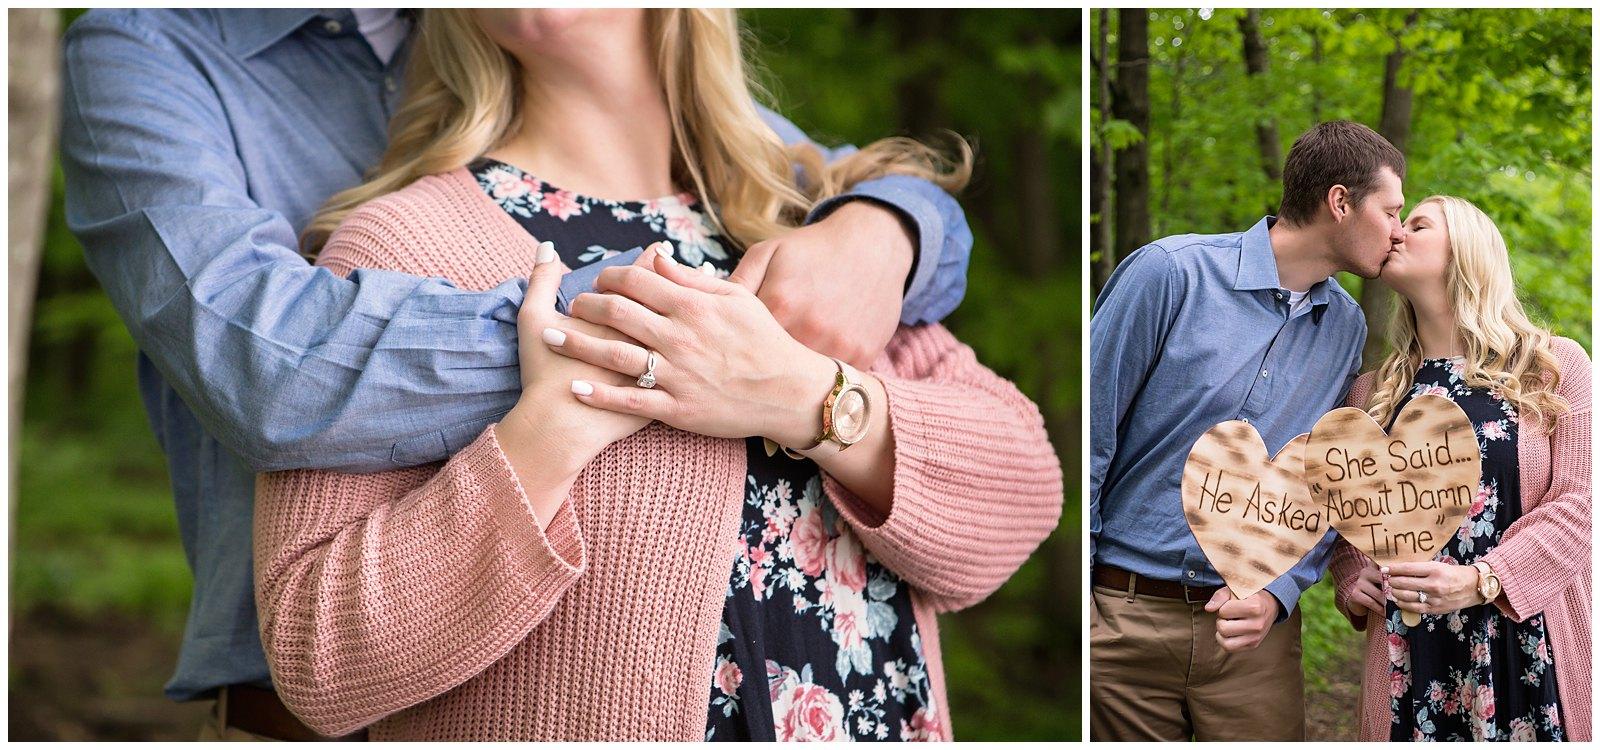 Cj Photography | www.cjphotogallery.net